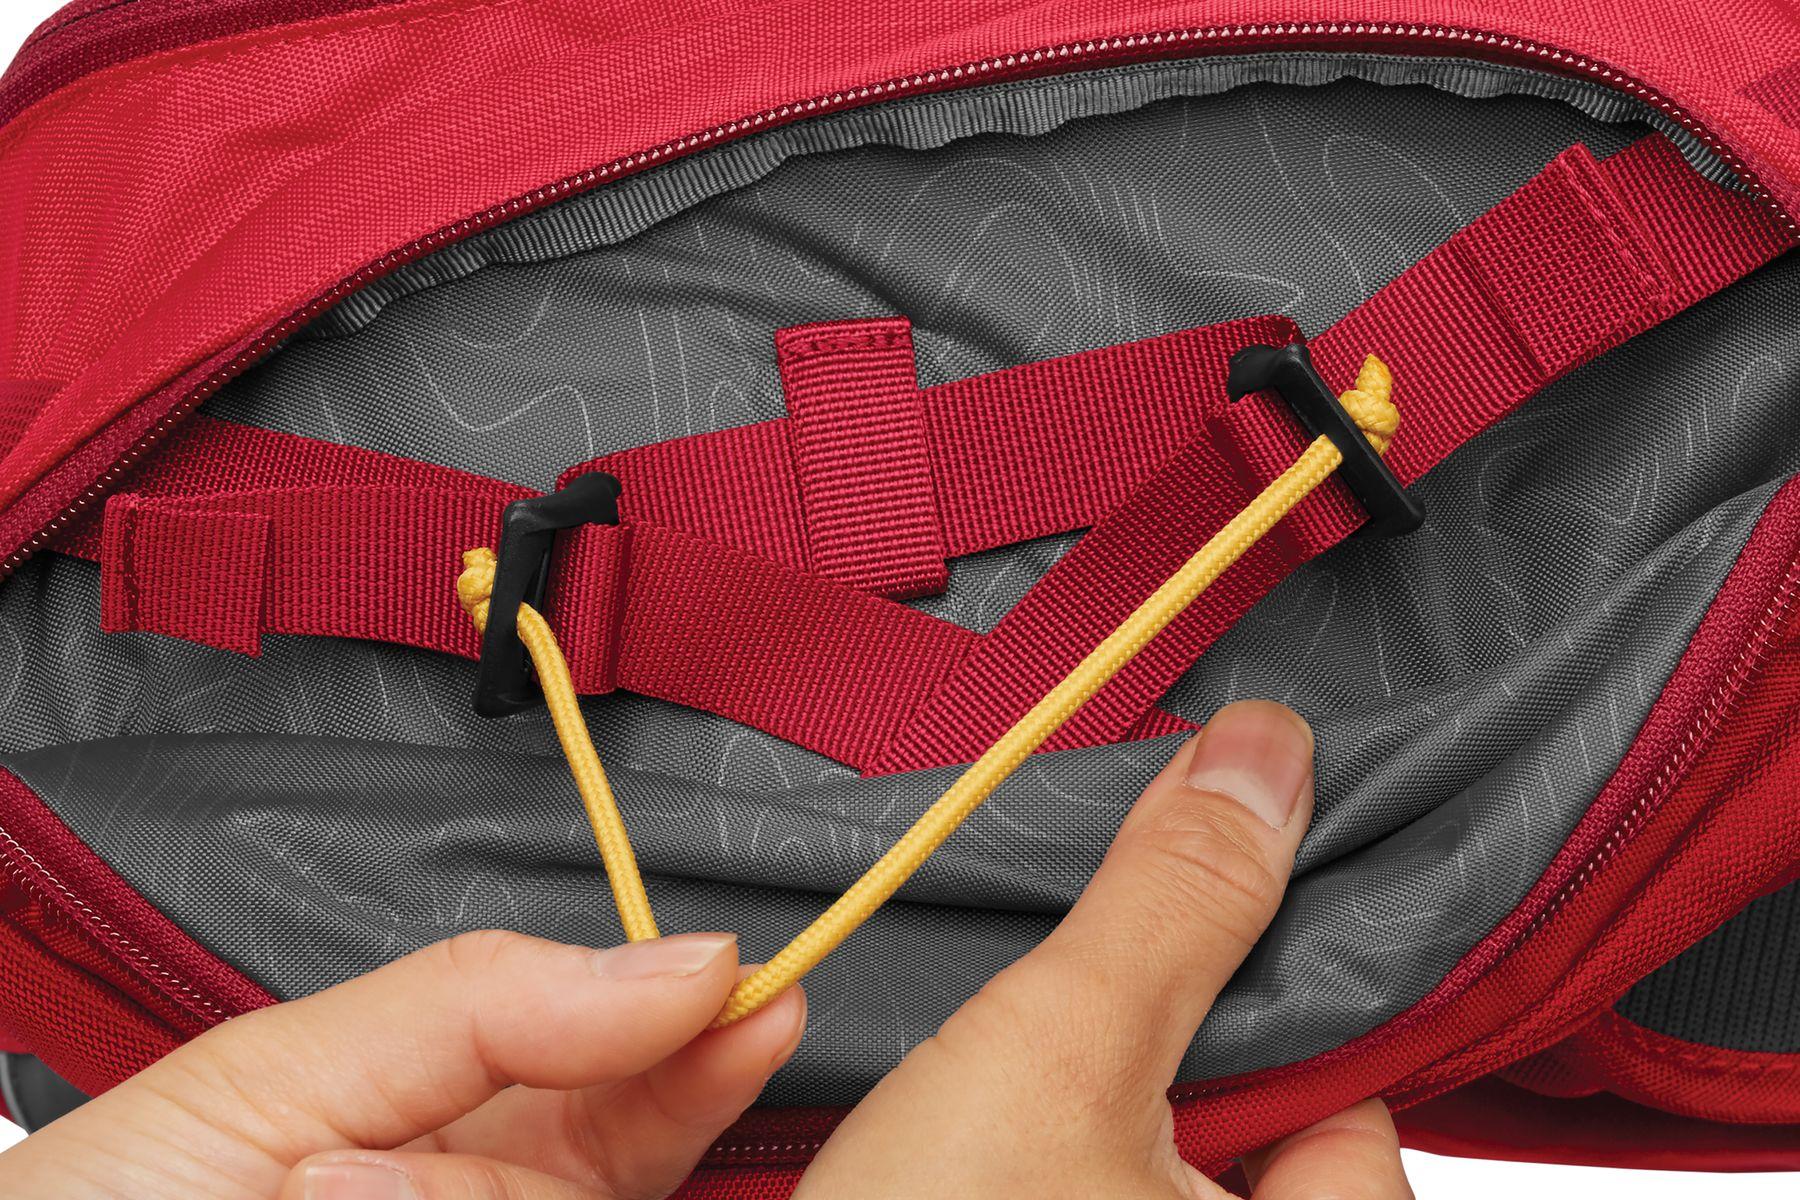 Handles of the Ruffwear pack shown here.